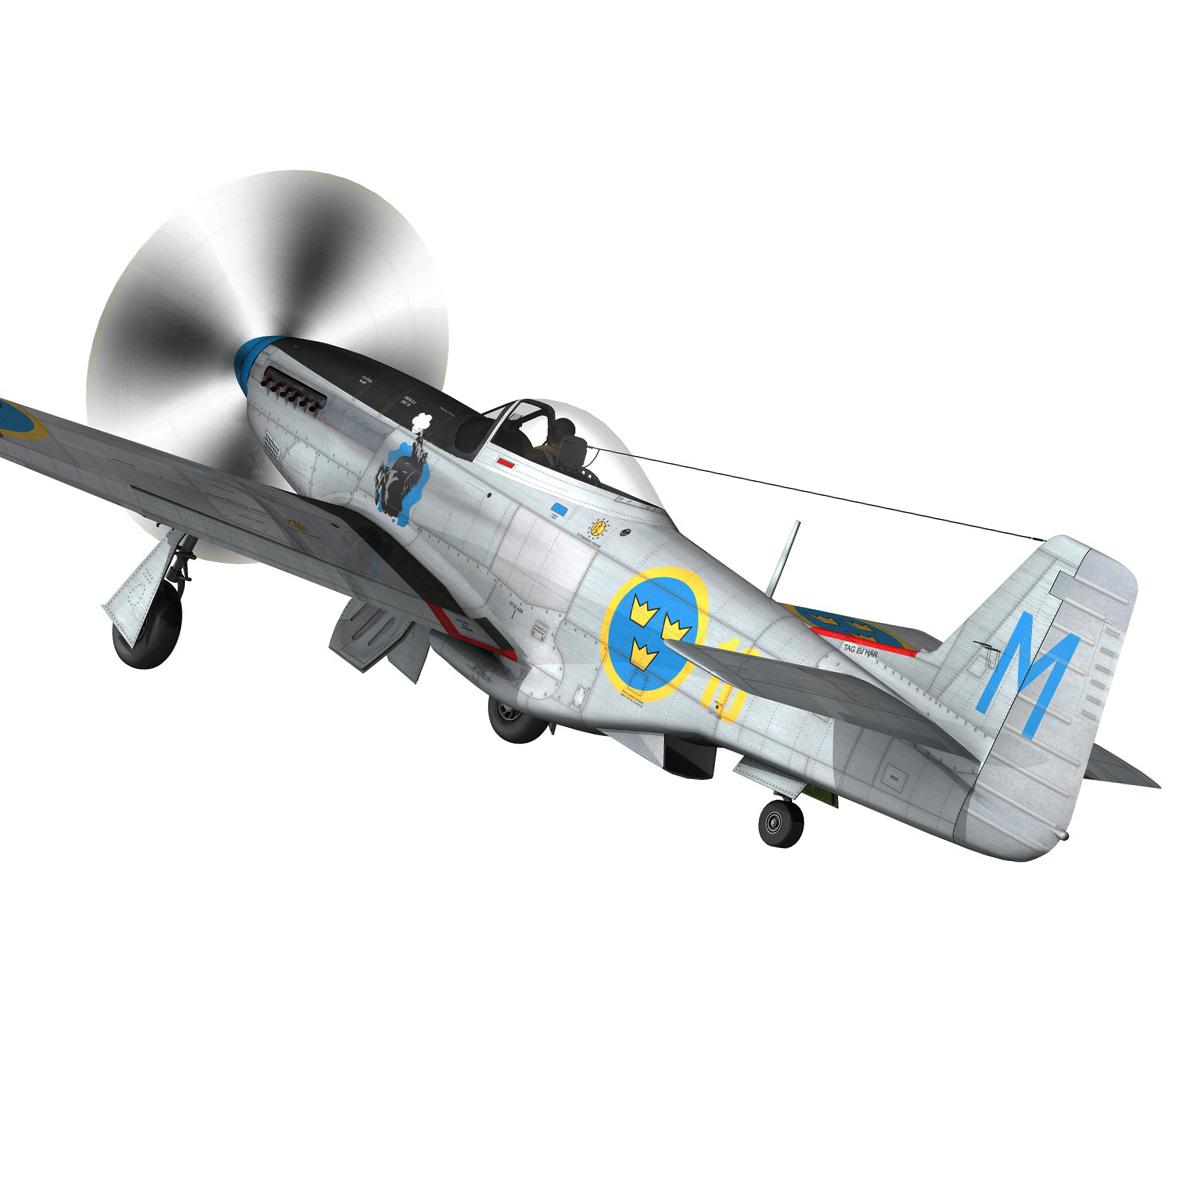 north american p-51d mustang – swedisch airforce 3d model fbx c4d lwo obj 268235